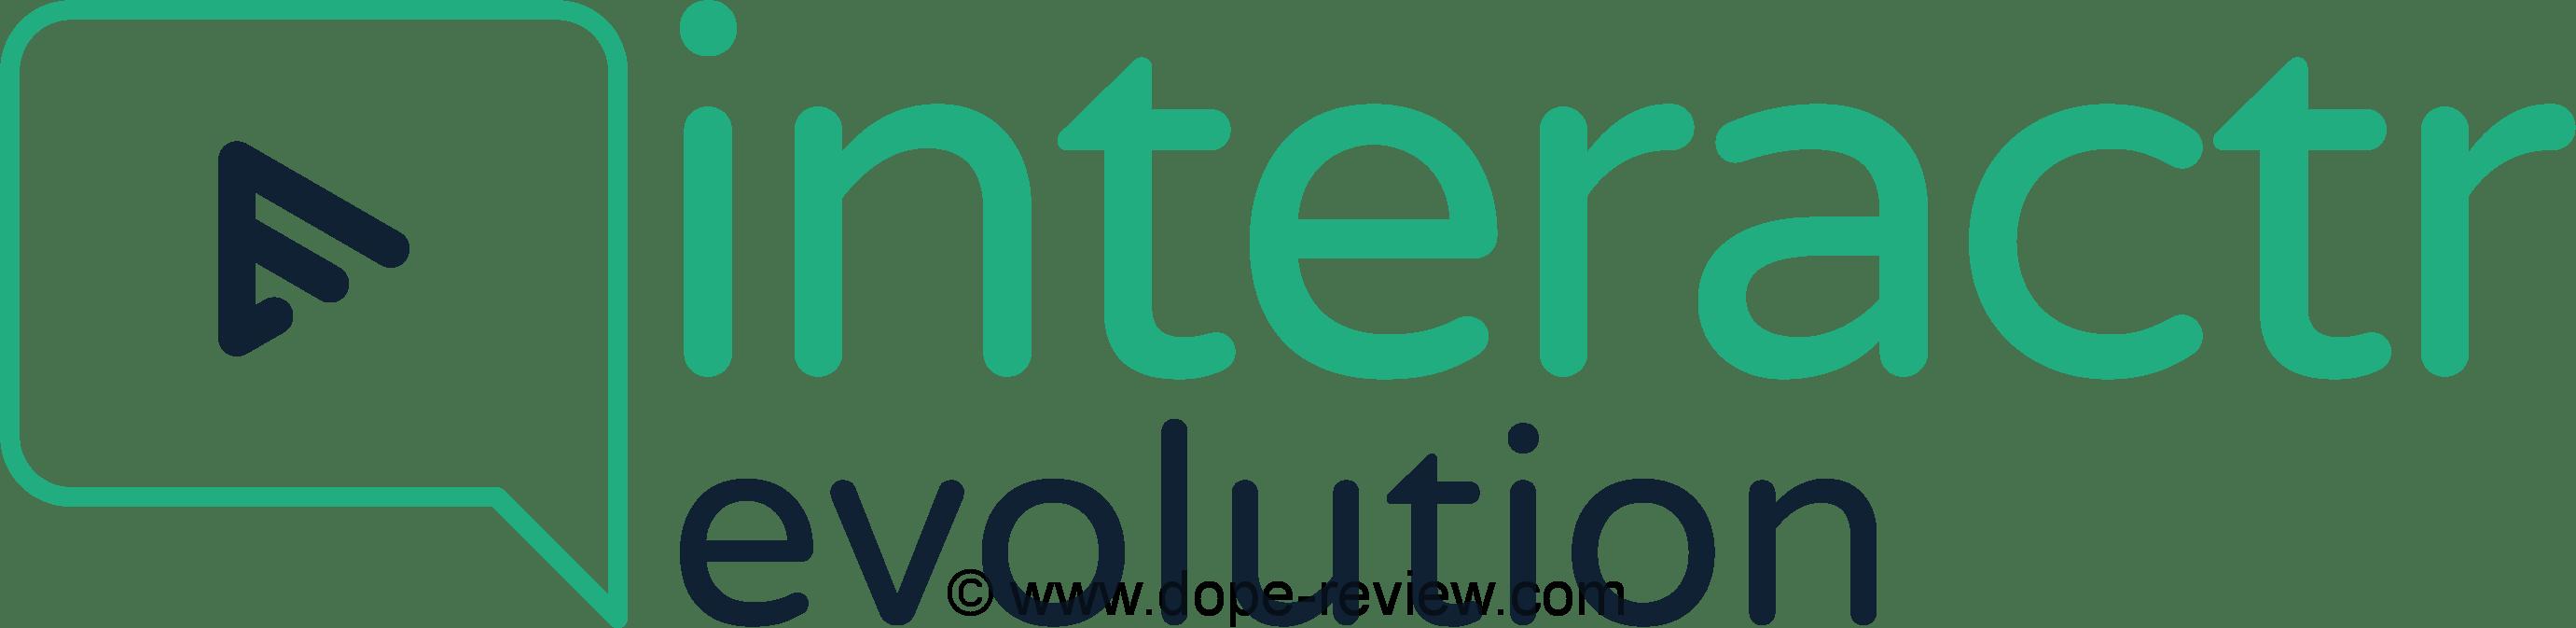 Interactr Evolution